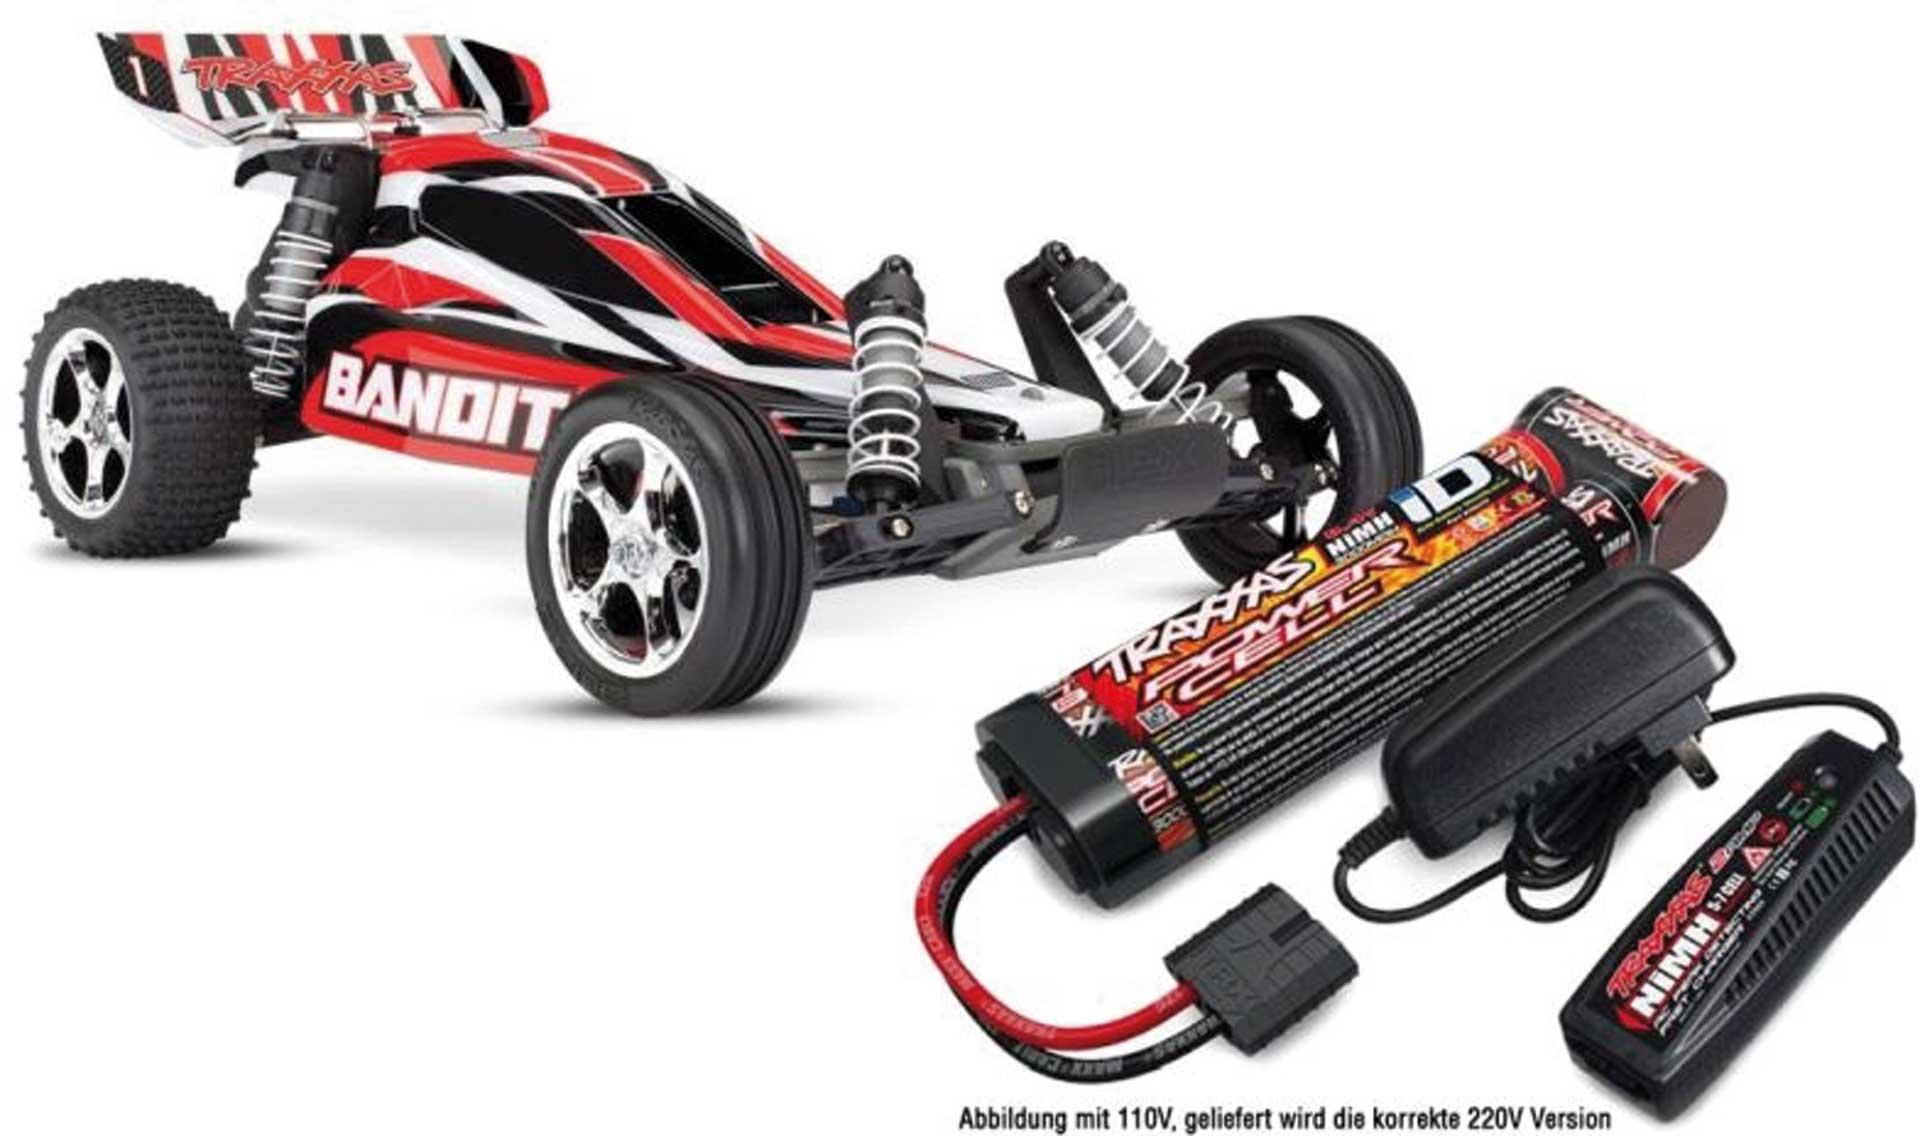 TRAXXAS BANDIT ROT BUGGY RTR MIT AKKU/LADER-SET *AKTION* 1/10 2WD BUGGY BRUSHED (TRX24054-4 + TRX2983G)